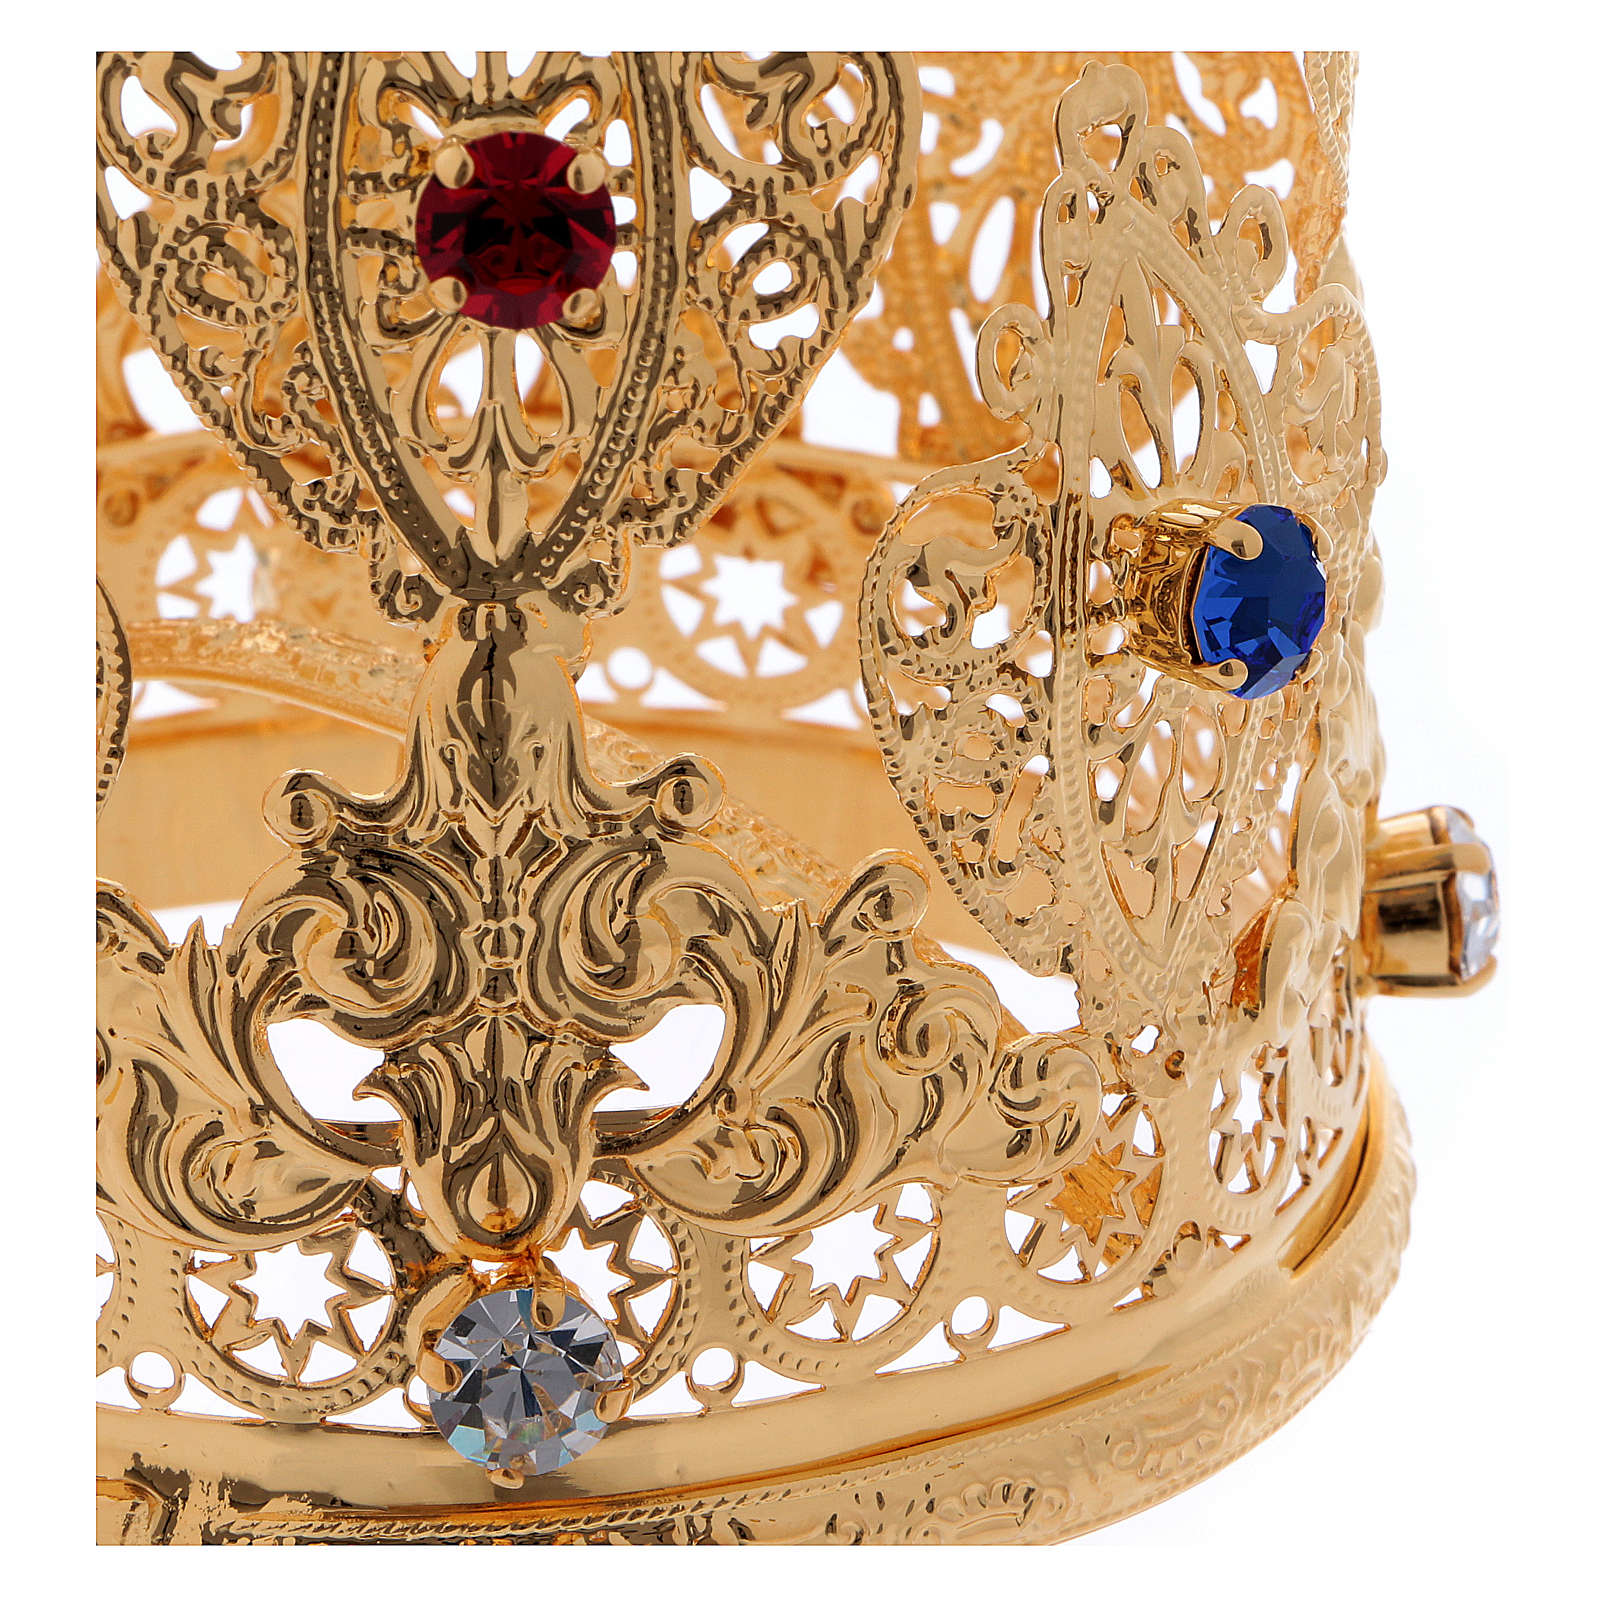 Coroncina ducale filigrana e gemme per statue diam. 8 cm 3